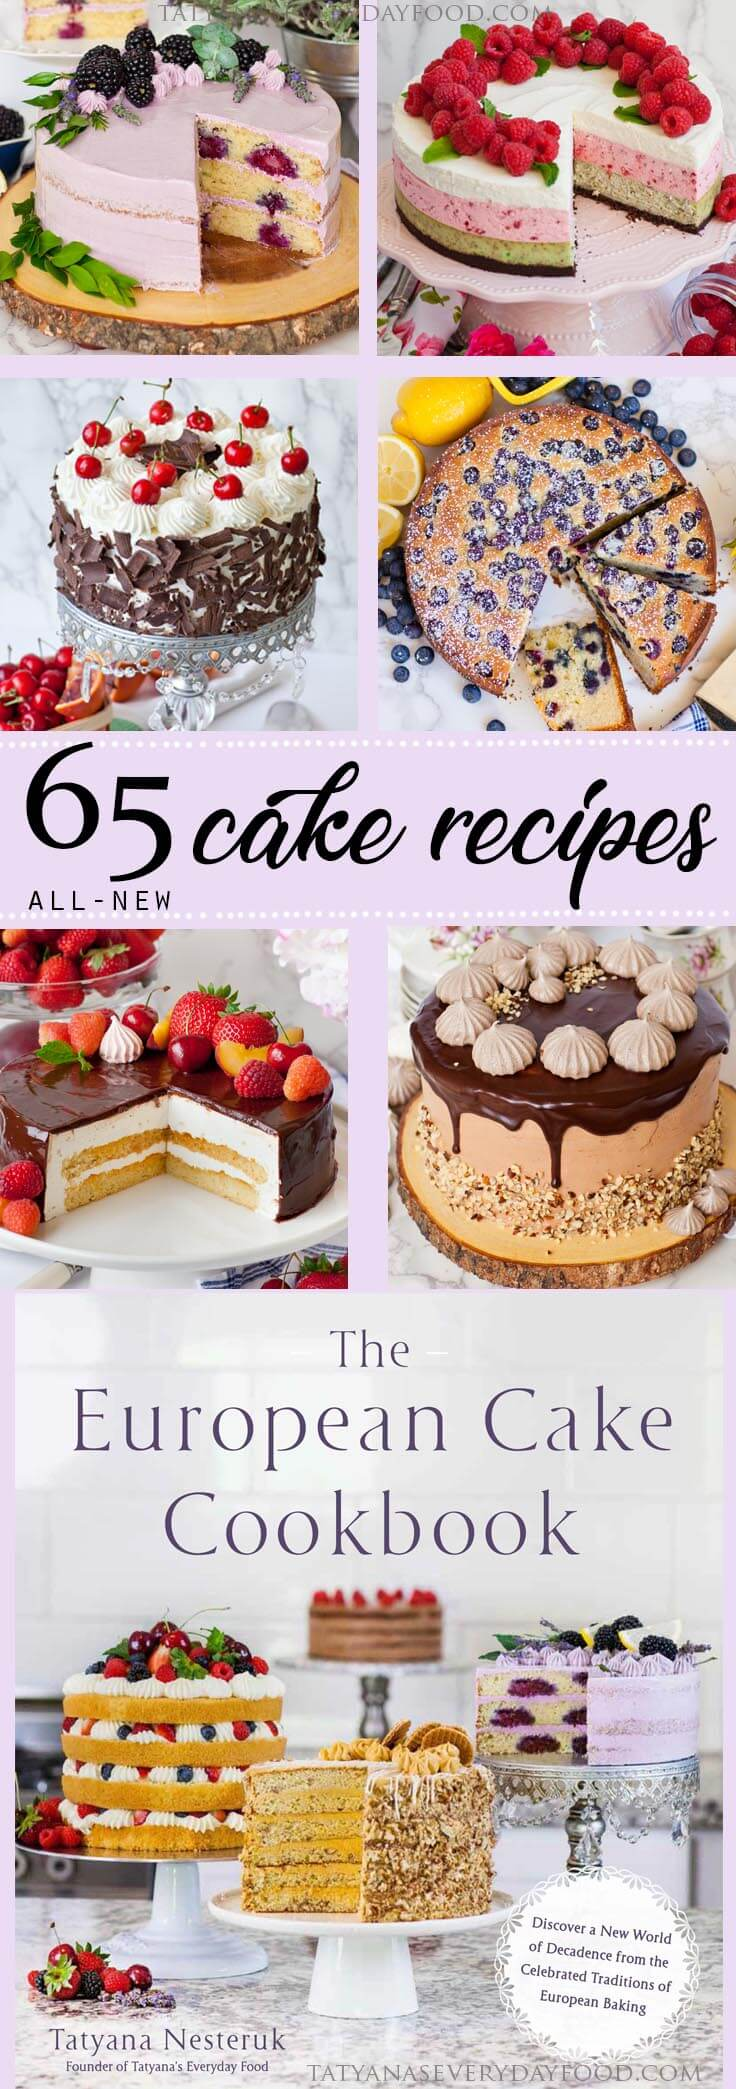 The European Cake Cookbook on sale now!